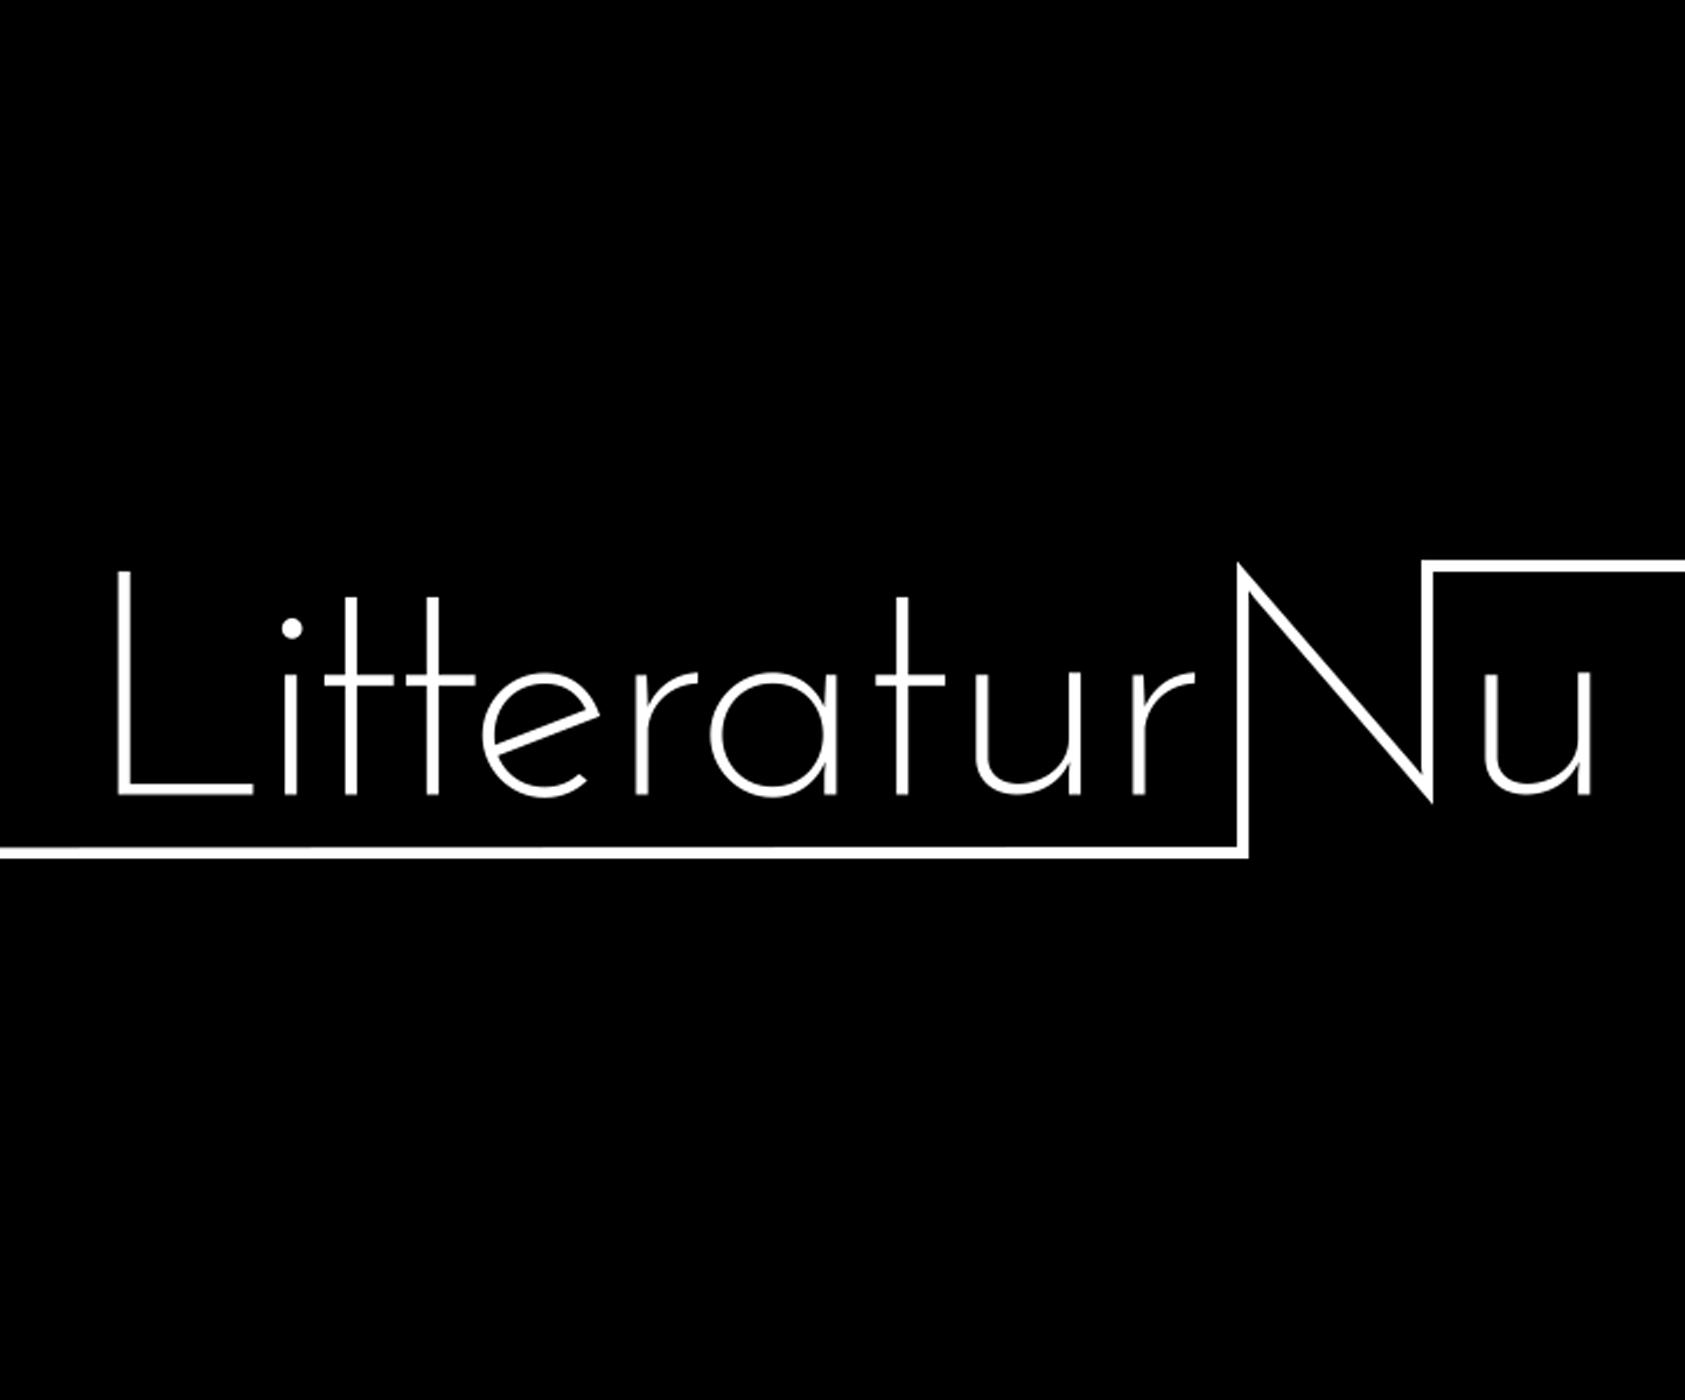 LitteraturLyd